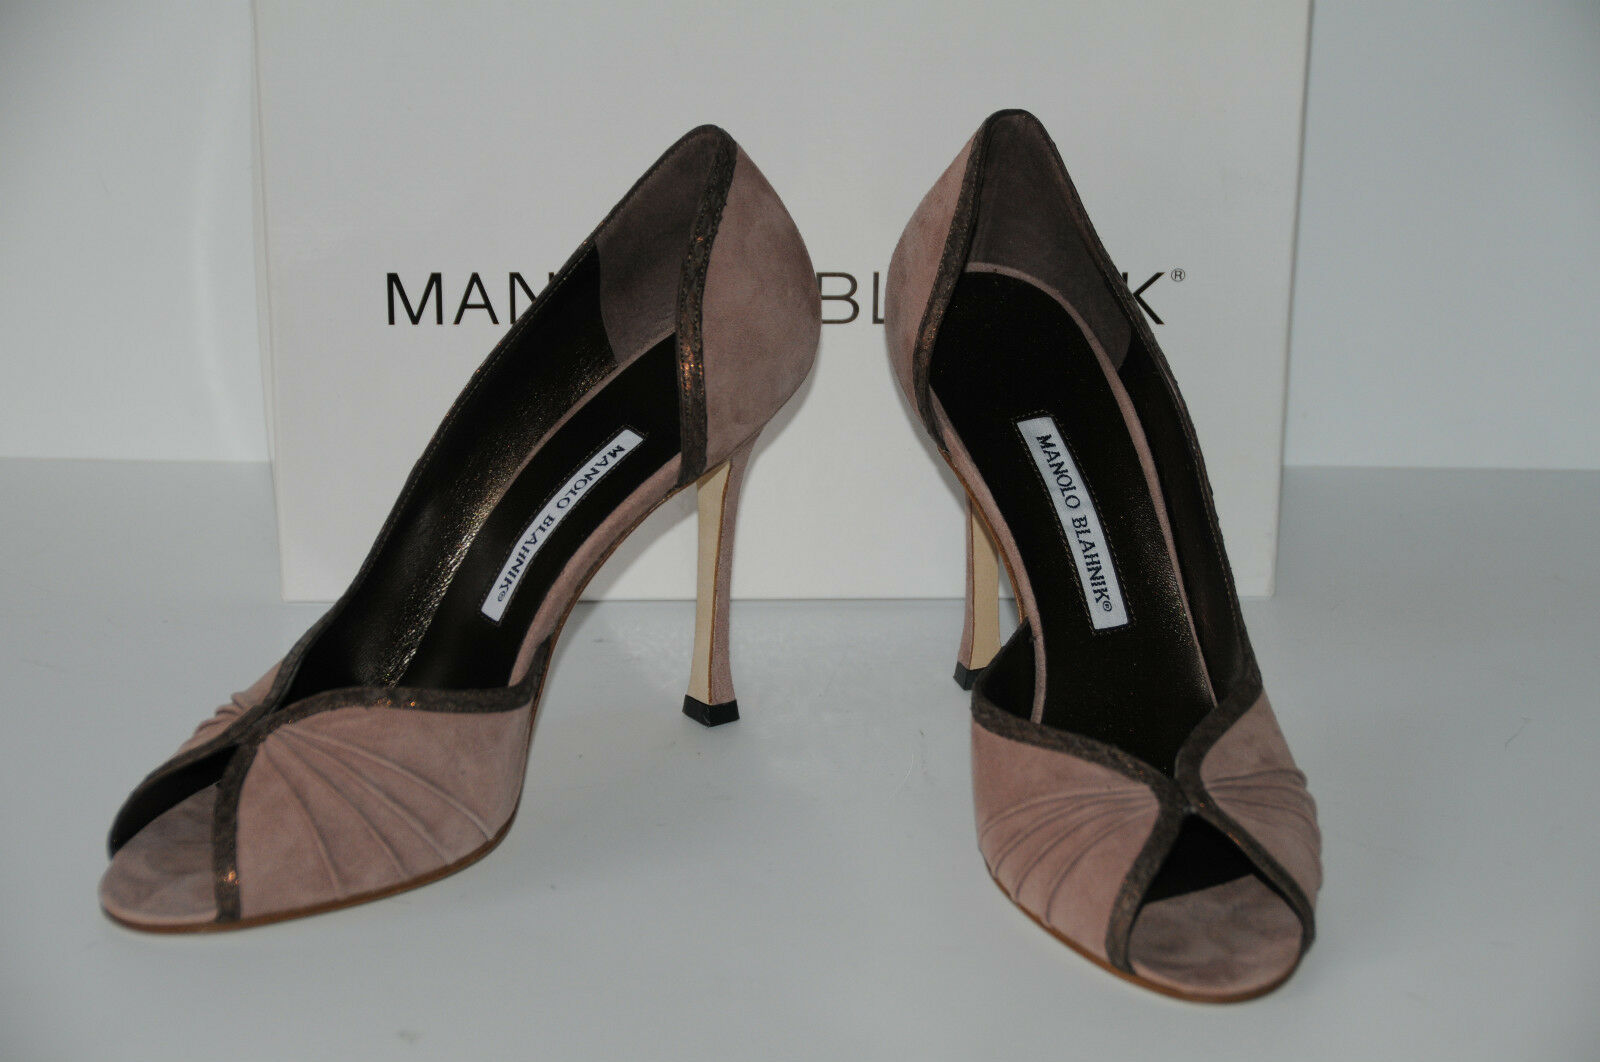 New MANOLO MANOLO MANOLO BLAHNIK Snake trim BEIGE BROWN suede DECI Peep toe SHOES HEELS 41.5 b750cc